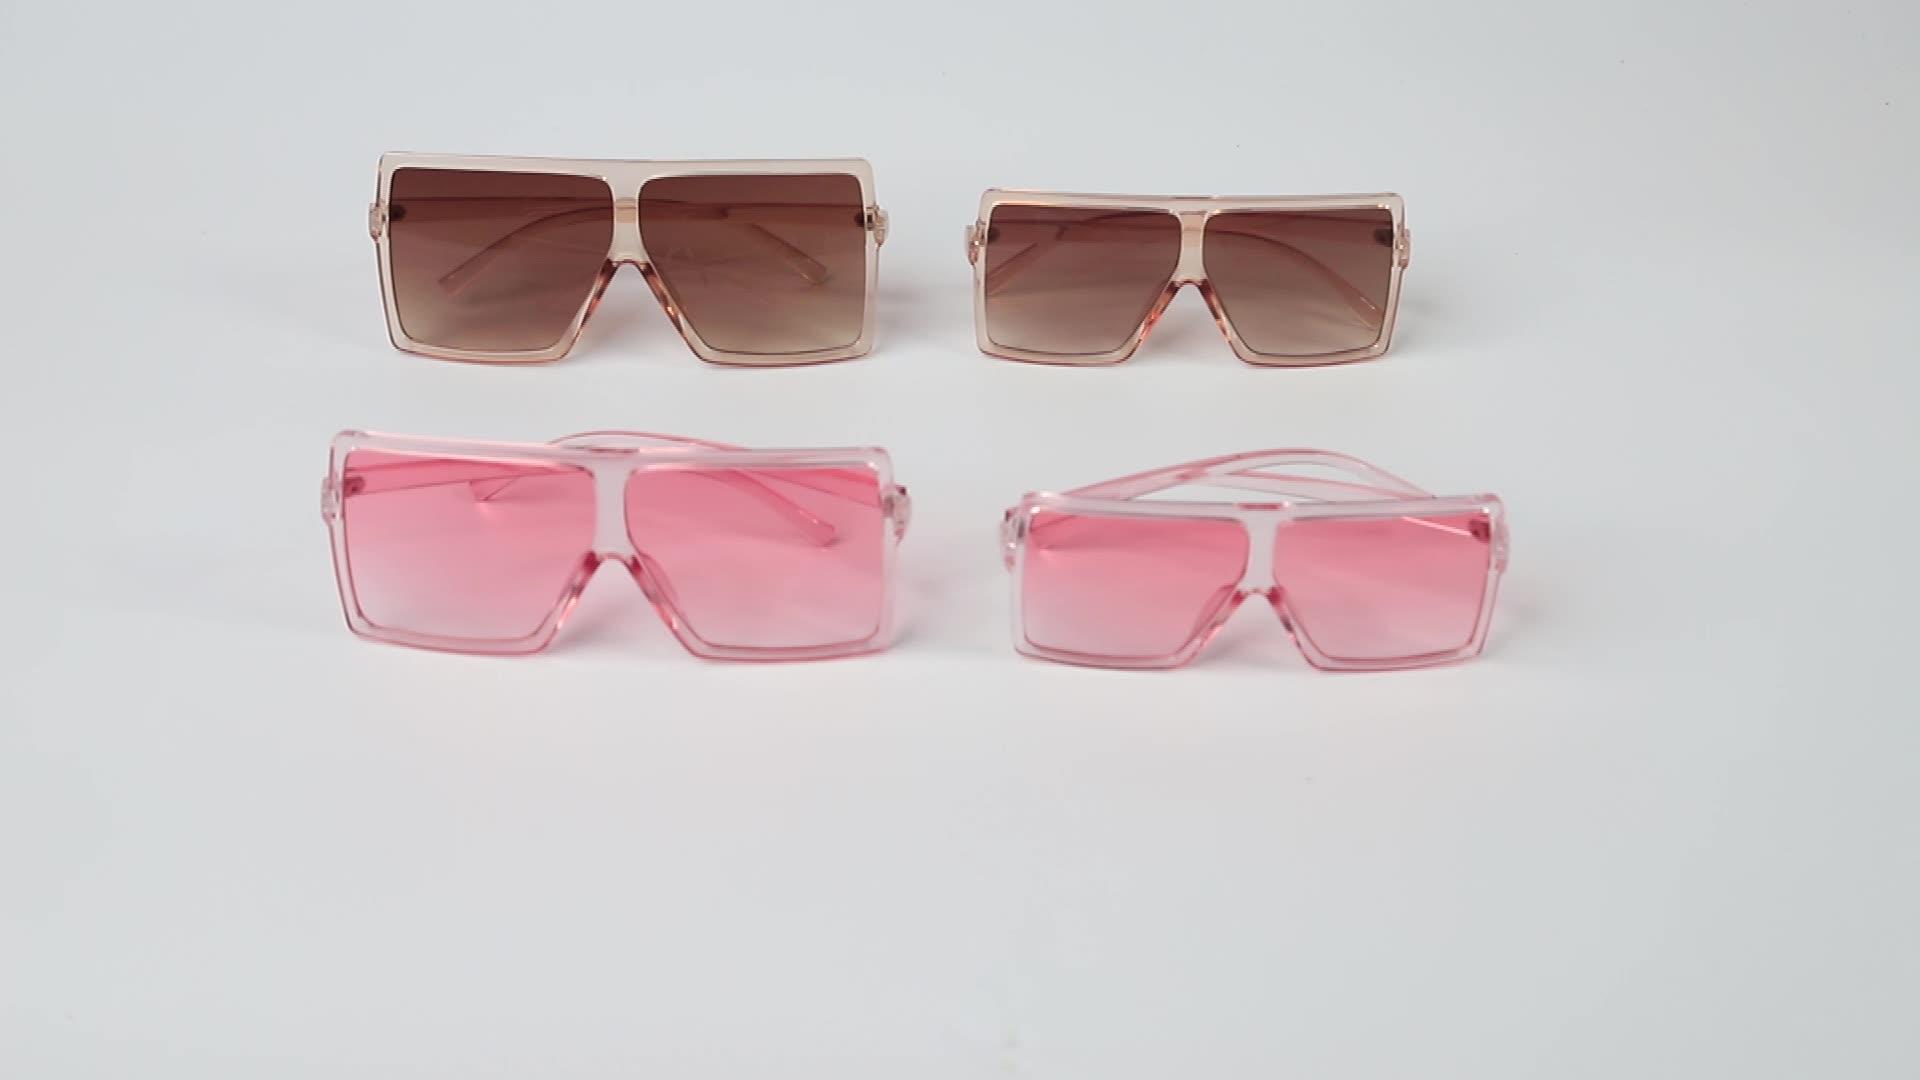 Kacamata Hitam Persegi untuk Anak, 1 Set 3 HIPPOS, Kacamata Hitam Plastik Bagian Atas Datar 2021 2 Buah Cocok untuk Anak Perempuan